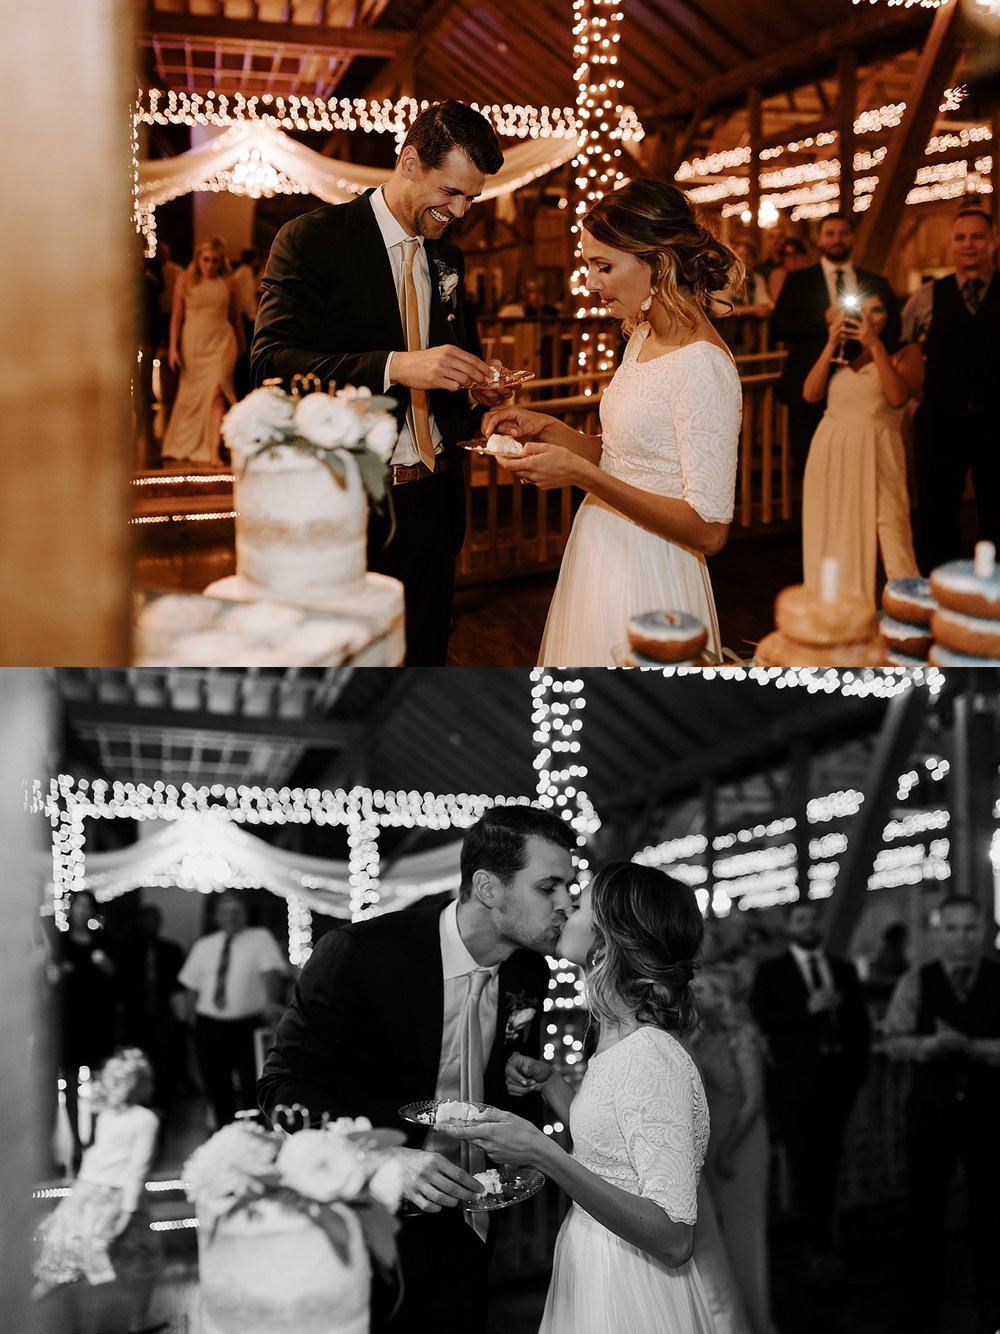 2ashley-sara-photography-pittsburgh-photographer-wedding-photographer-brookside-farm-wedding-louisville-ohio.jpg